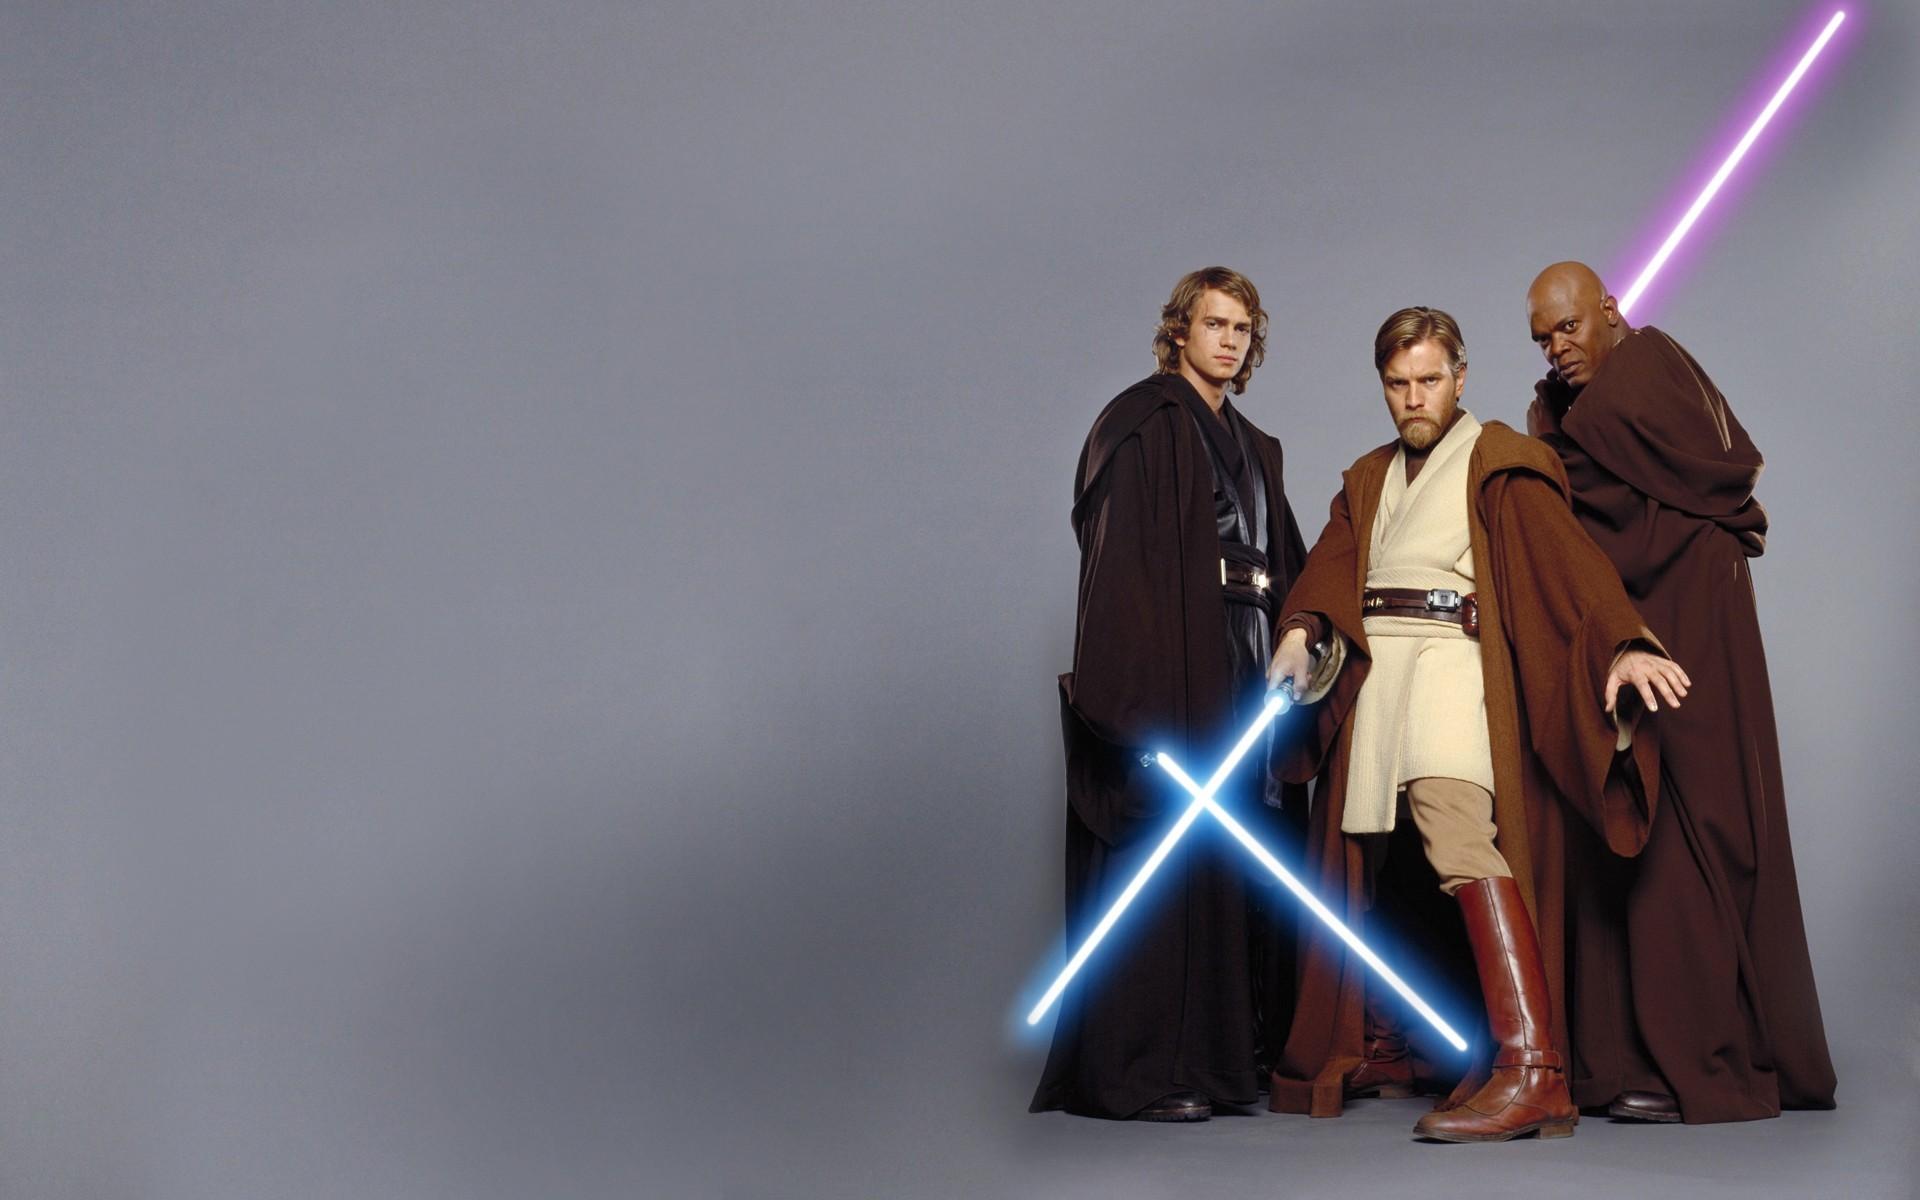 wallpaper Star Wars · lightsabers · Anakin Skywalker · Obi-Wan Kenobi